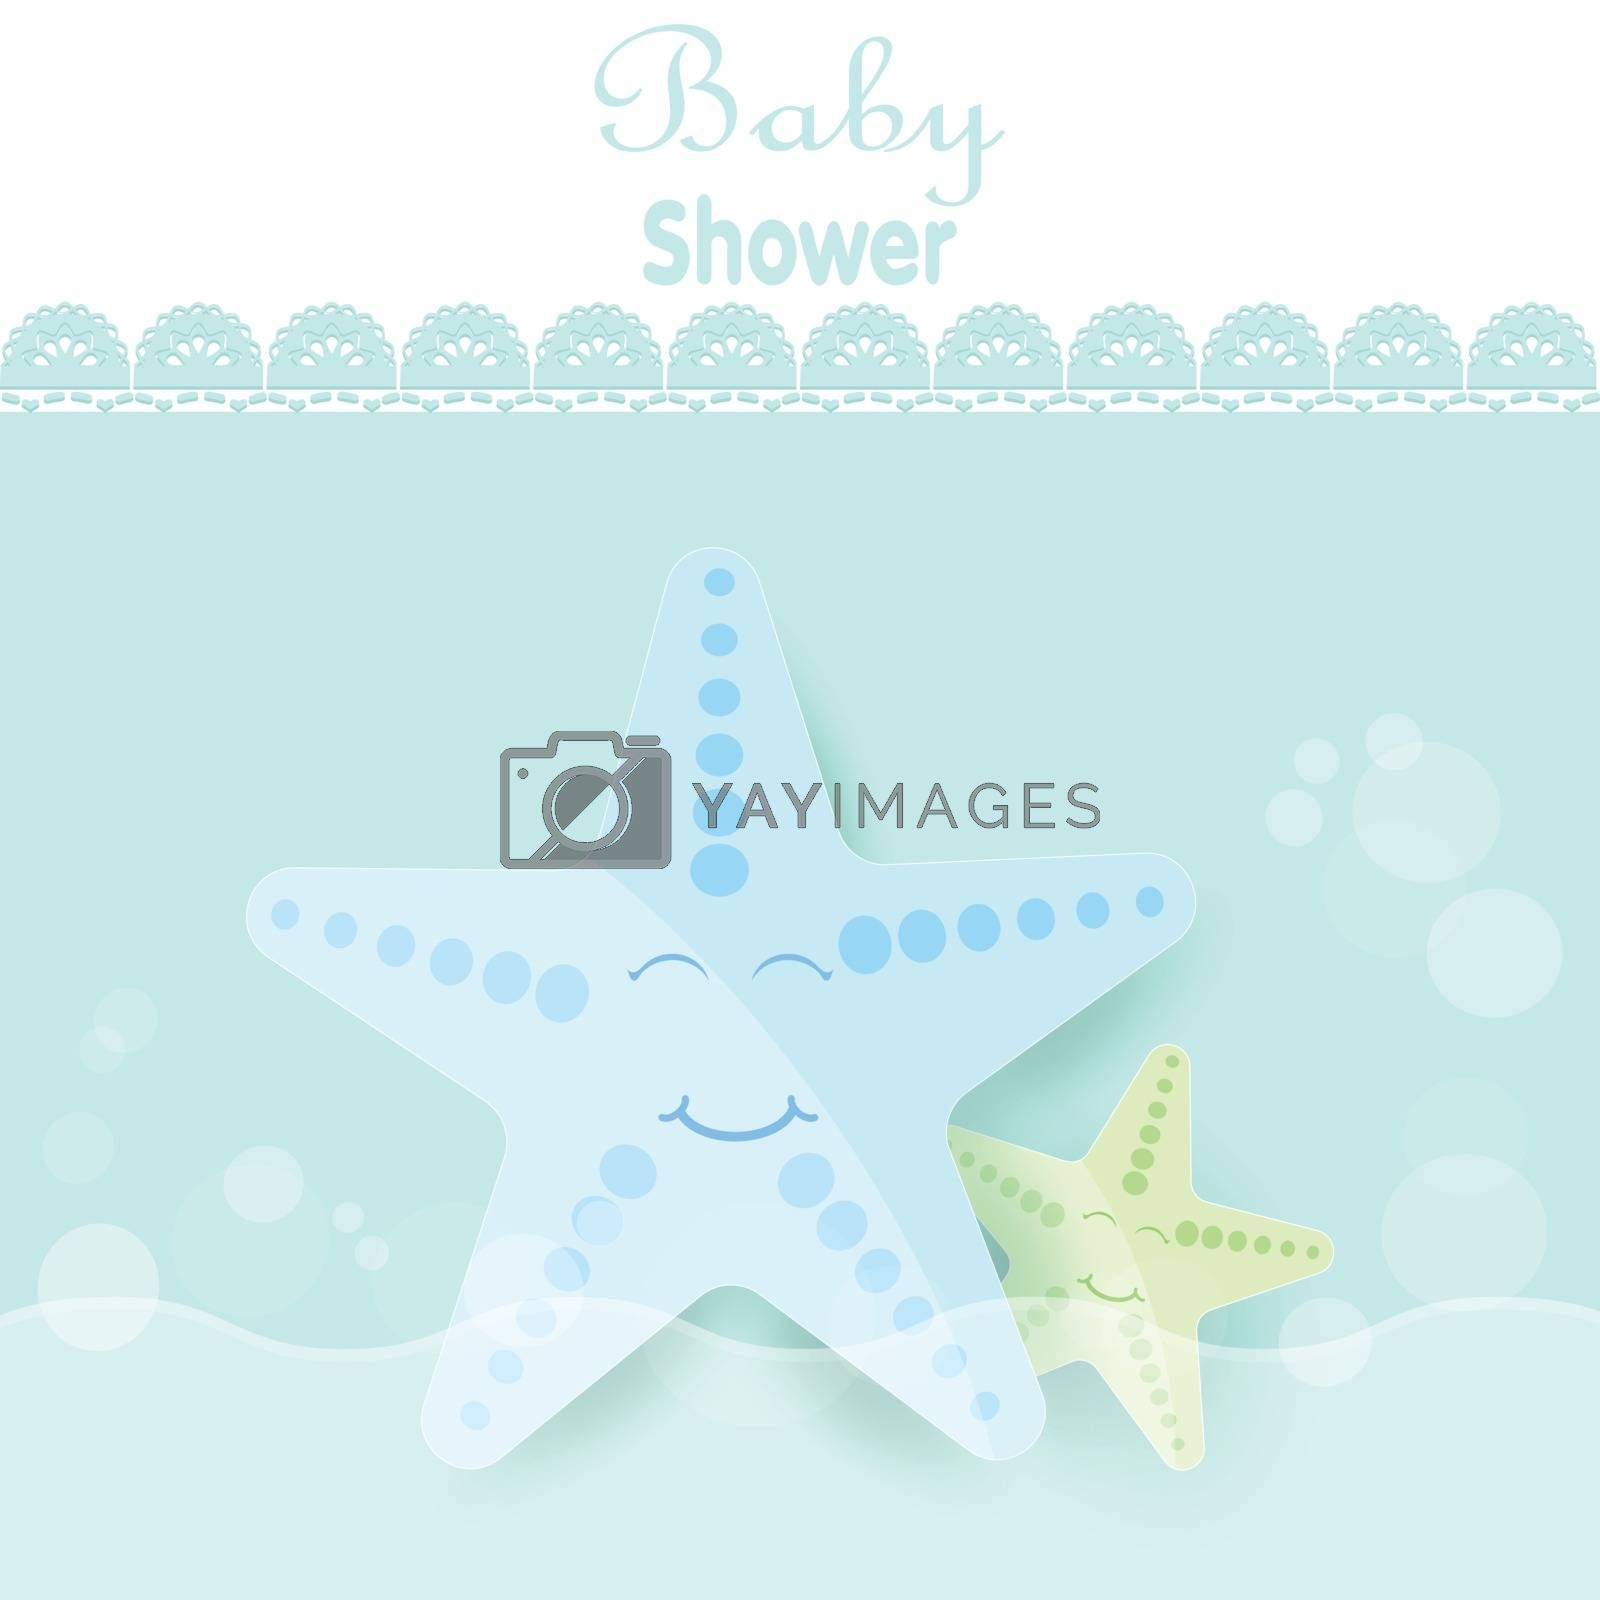 Baby shower card cute cartoon Starfish for greeting card, birthday card. Paper art marine style illustration